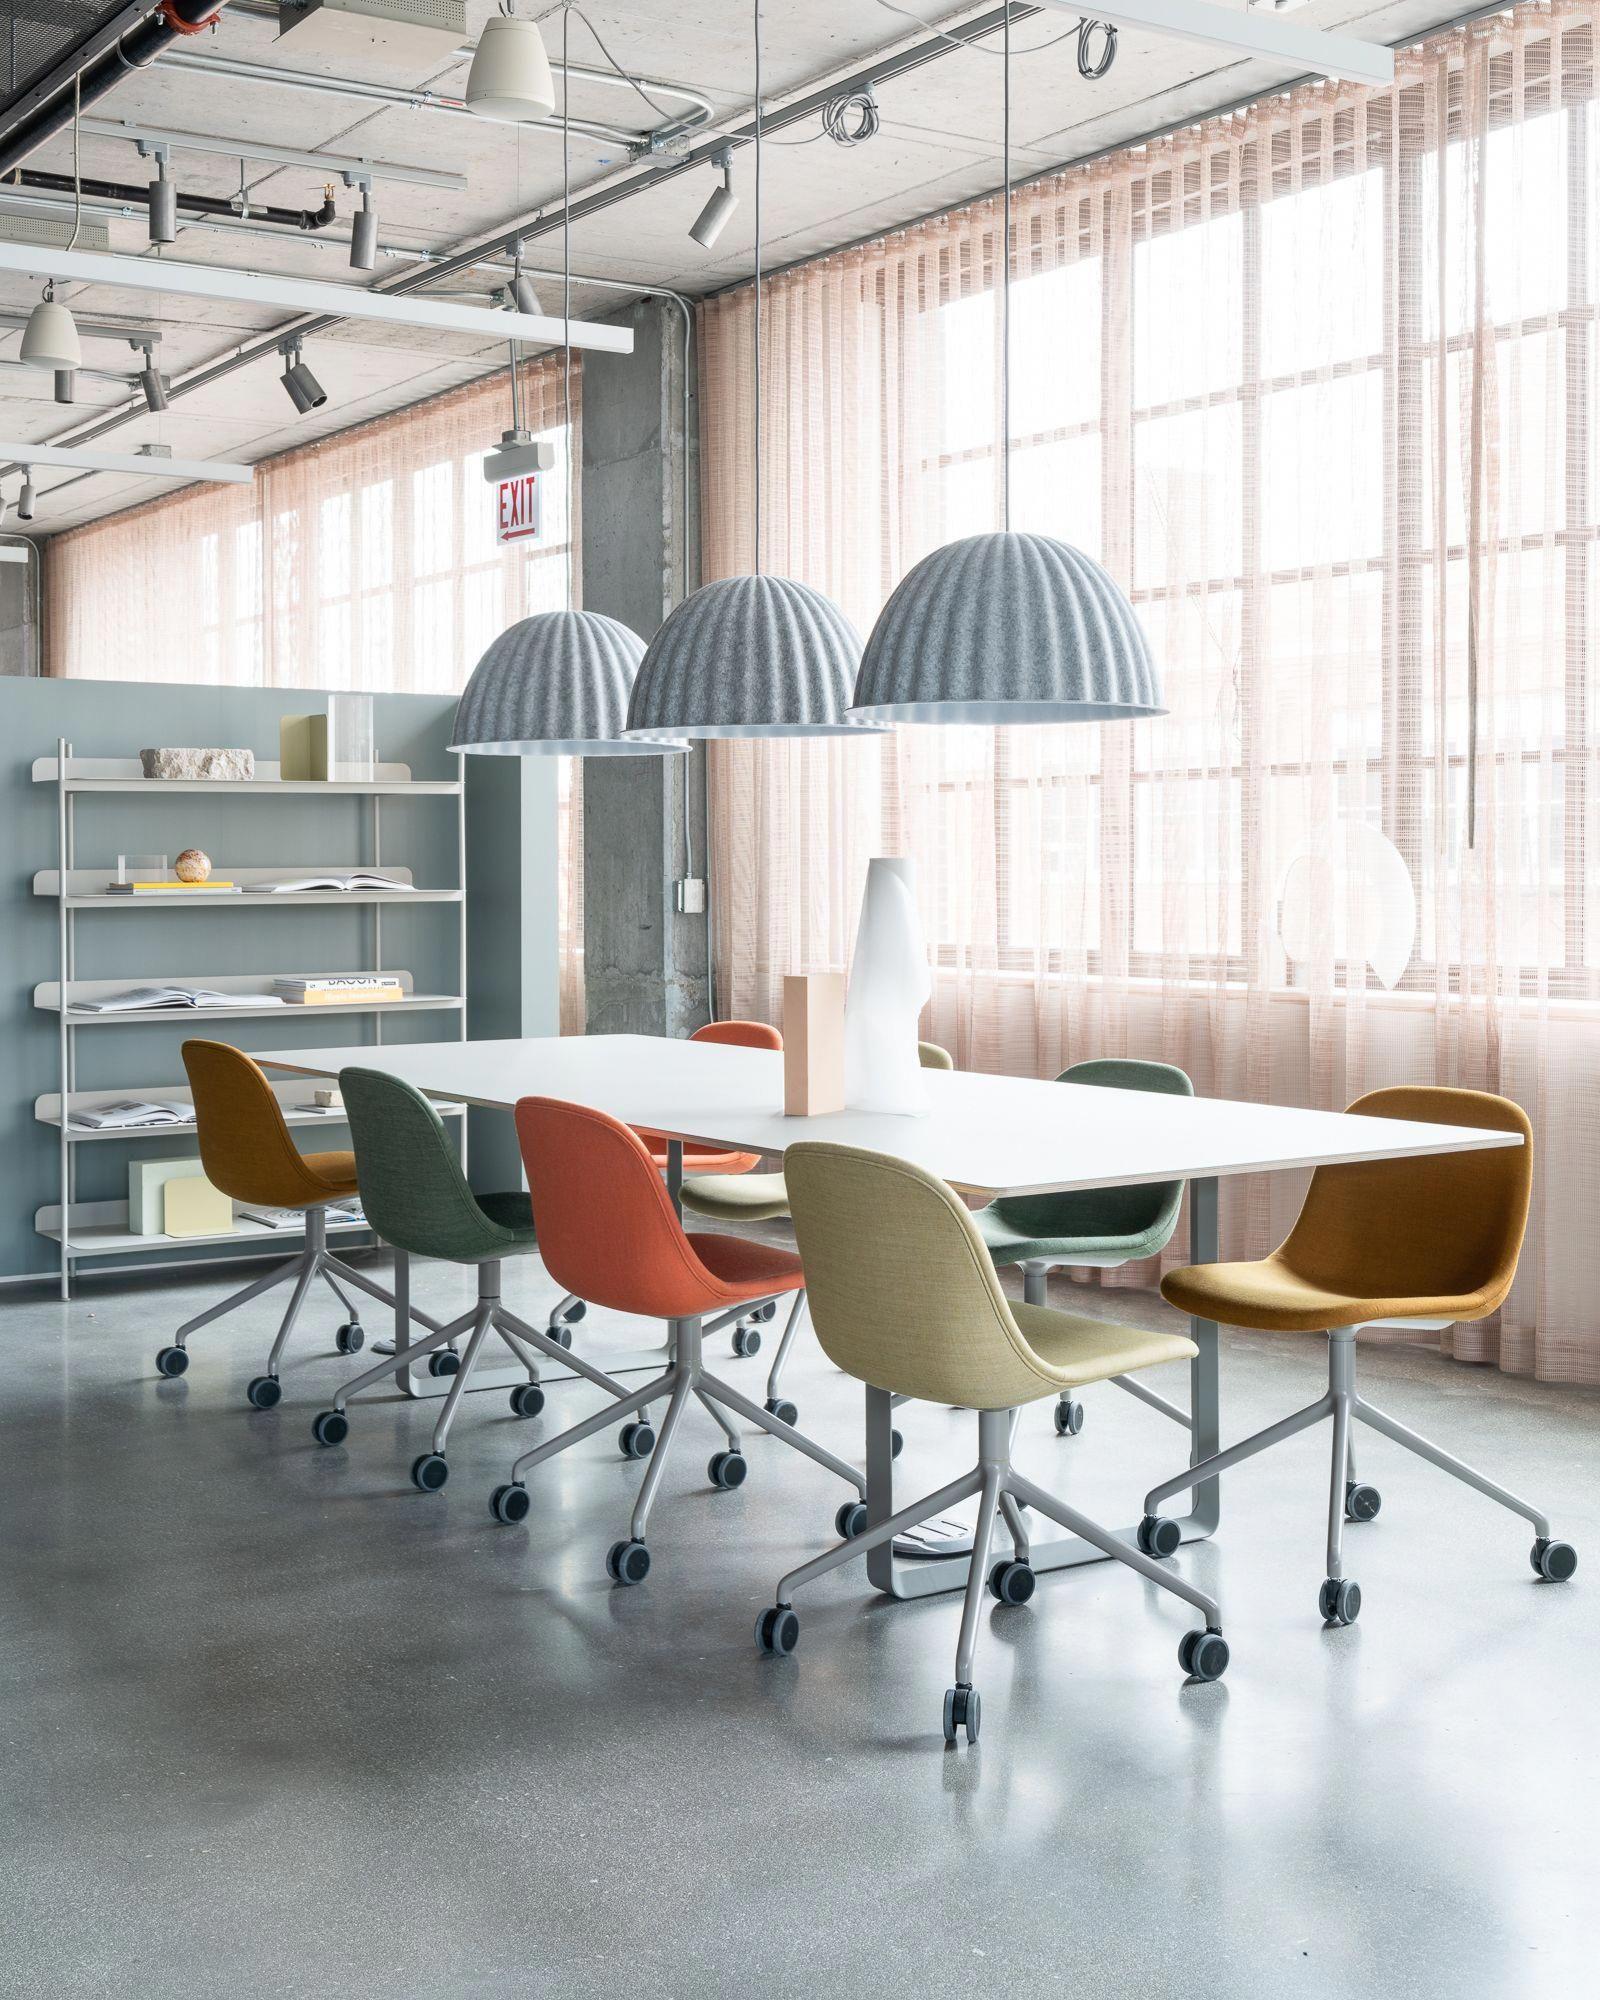 Home Officeinterior Design Ideas: Office Waiting Room Chairs #BlackDiningRoomChairs ID